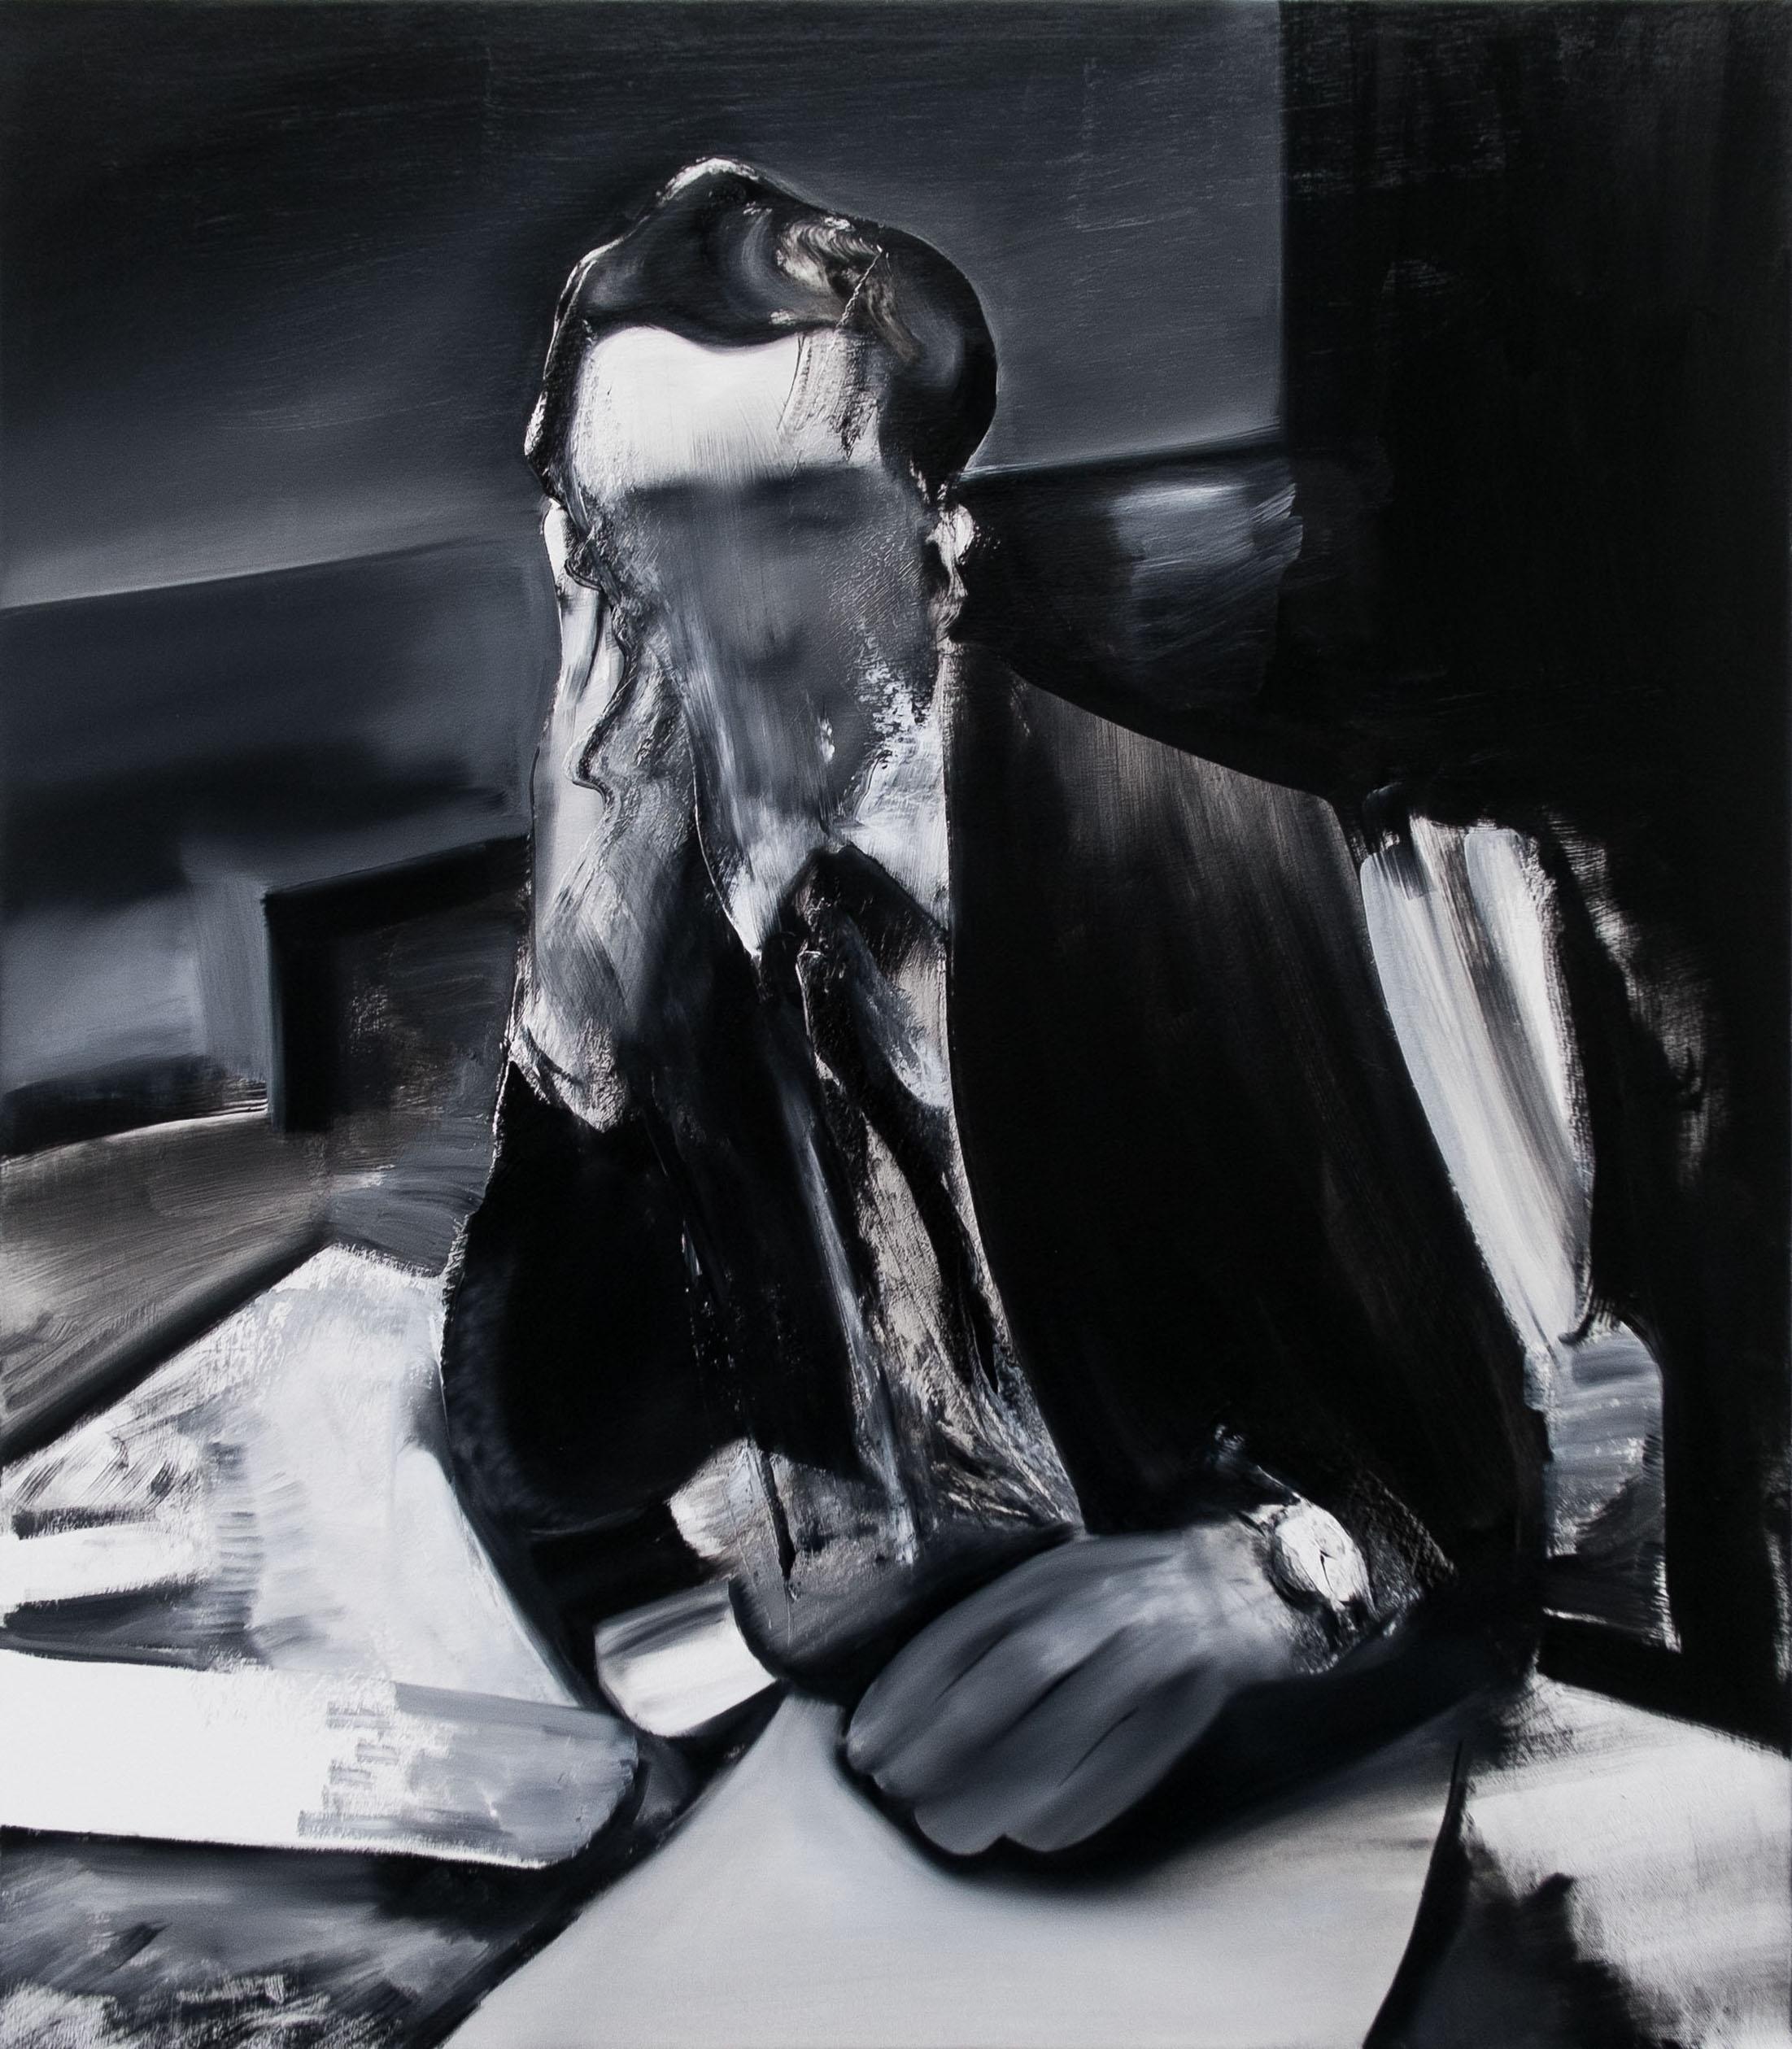 2019  Oil on canvas  80cm x 70cm